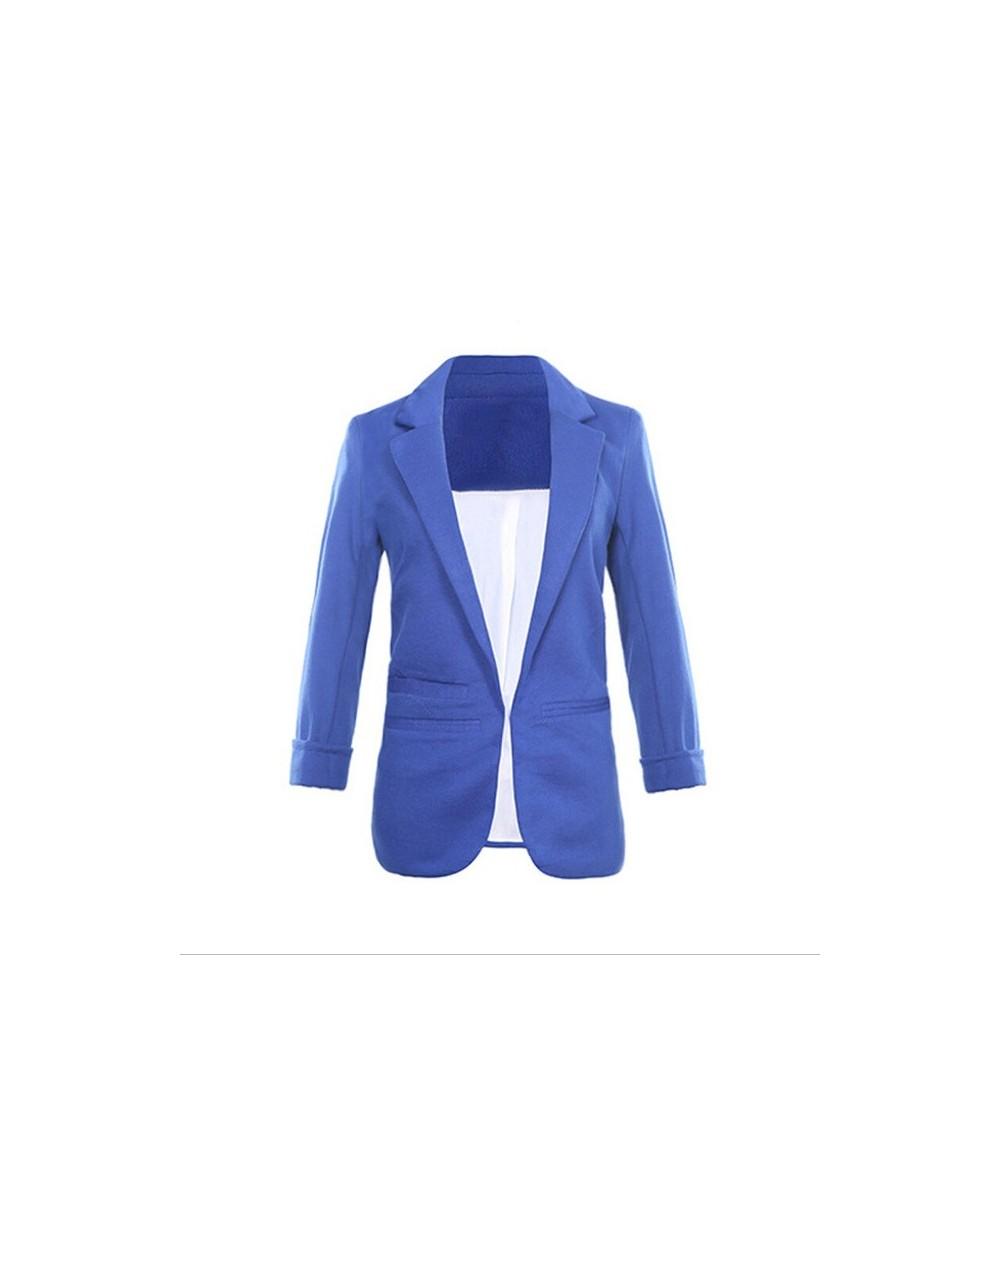 Front Notched Blazer 2018 autumn Women Formal Jackets Slim Fit Blazer white Ladies suits 11 colors Open Office Work size S-X...